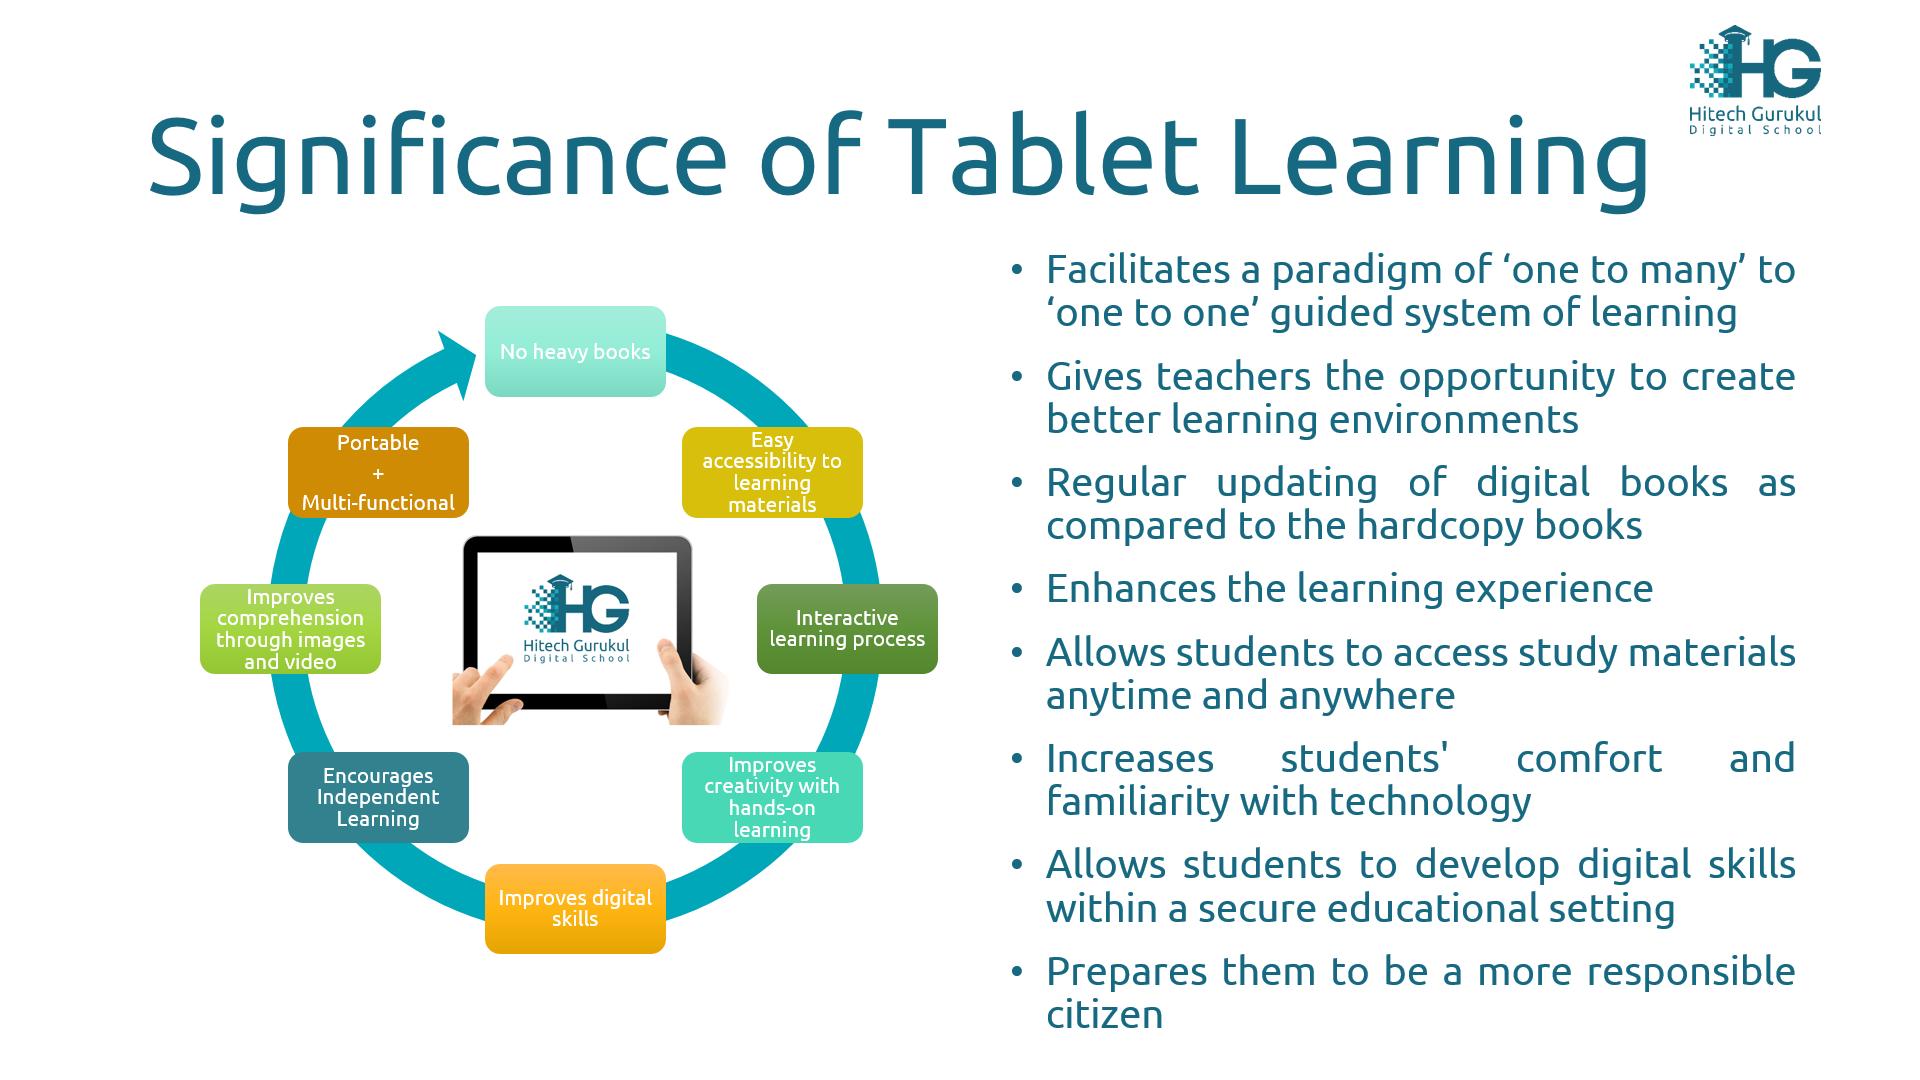 Best CBSE School in kota - tablet learning center